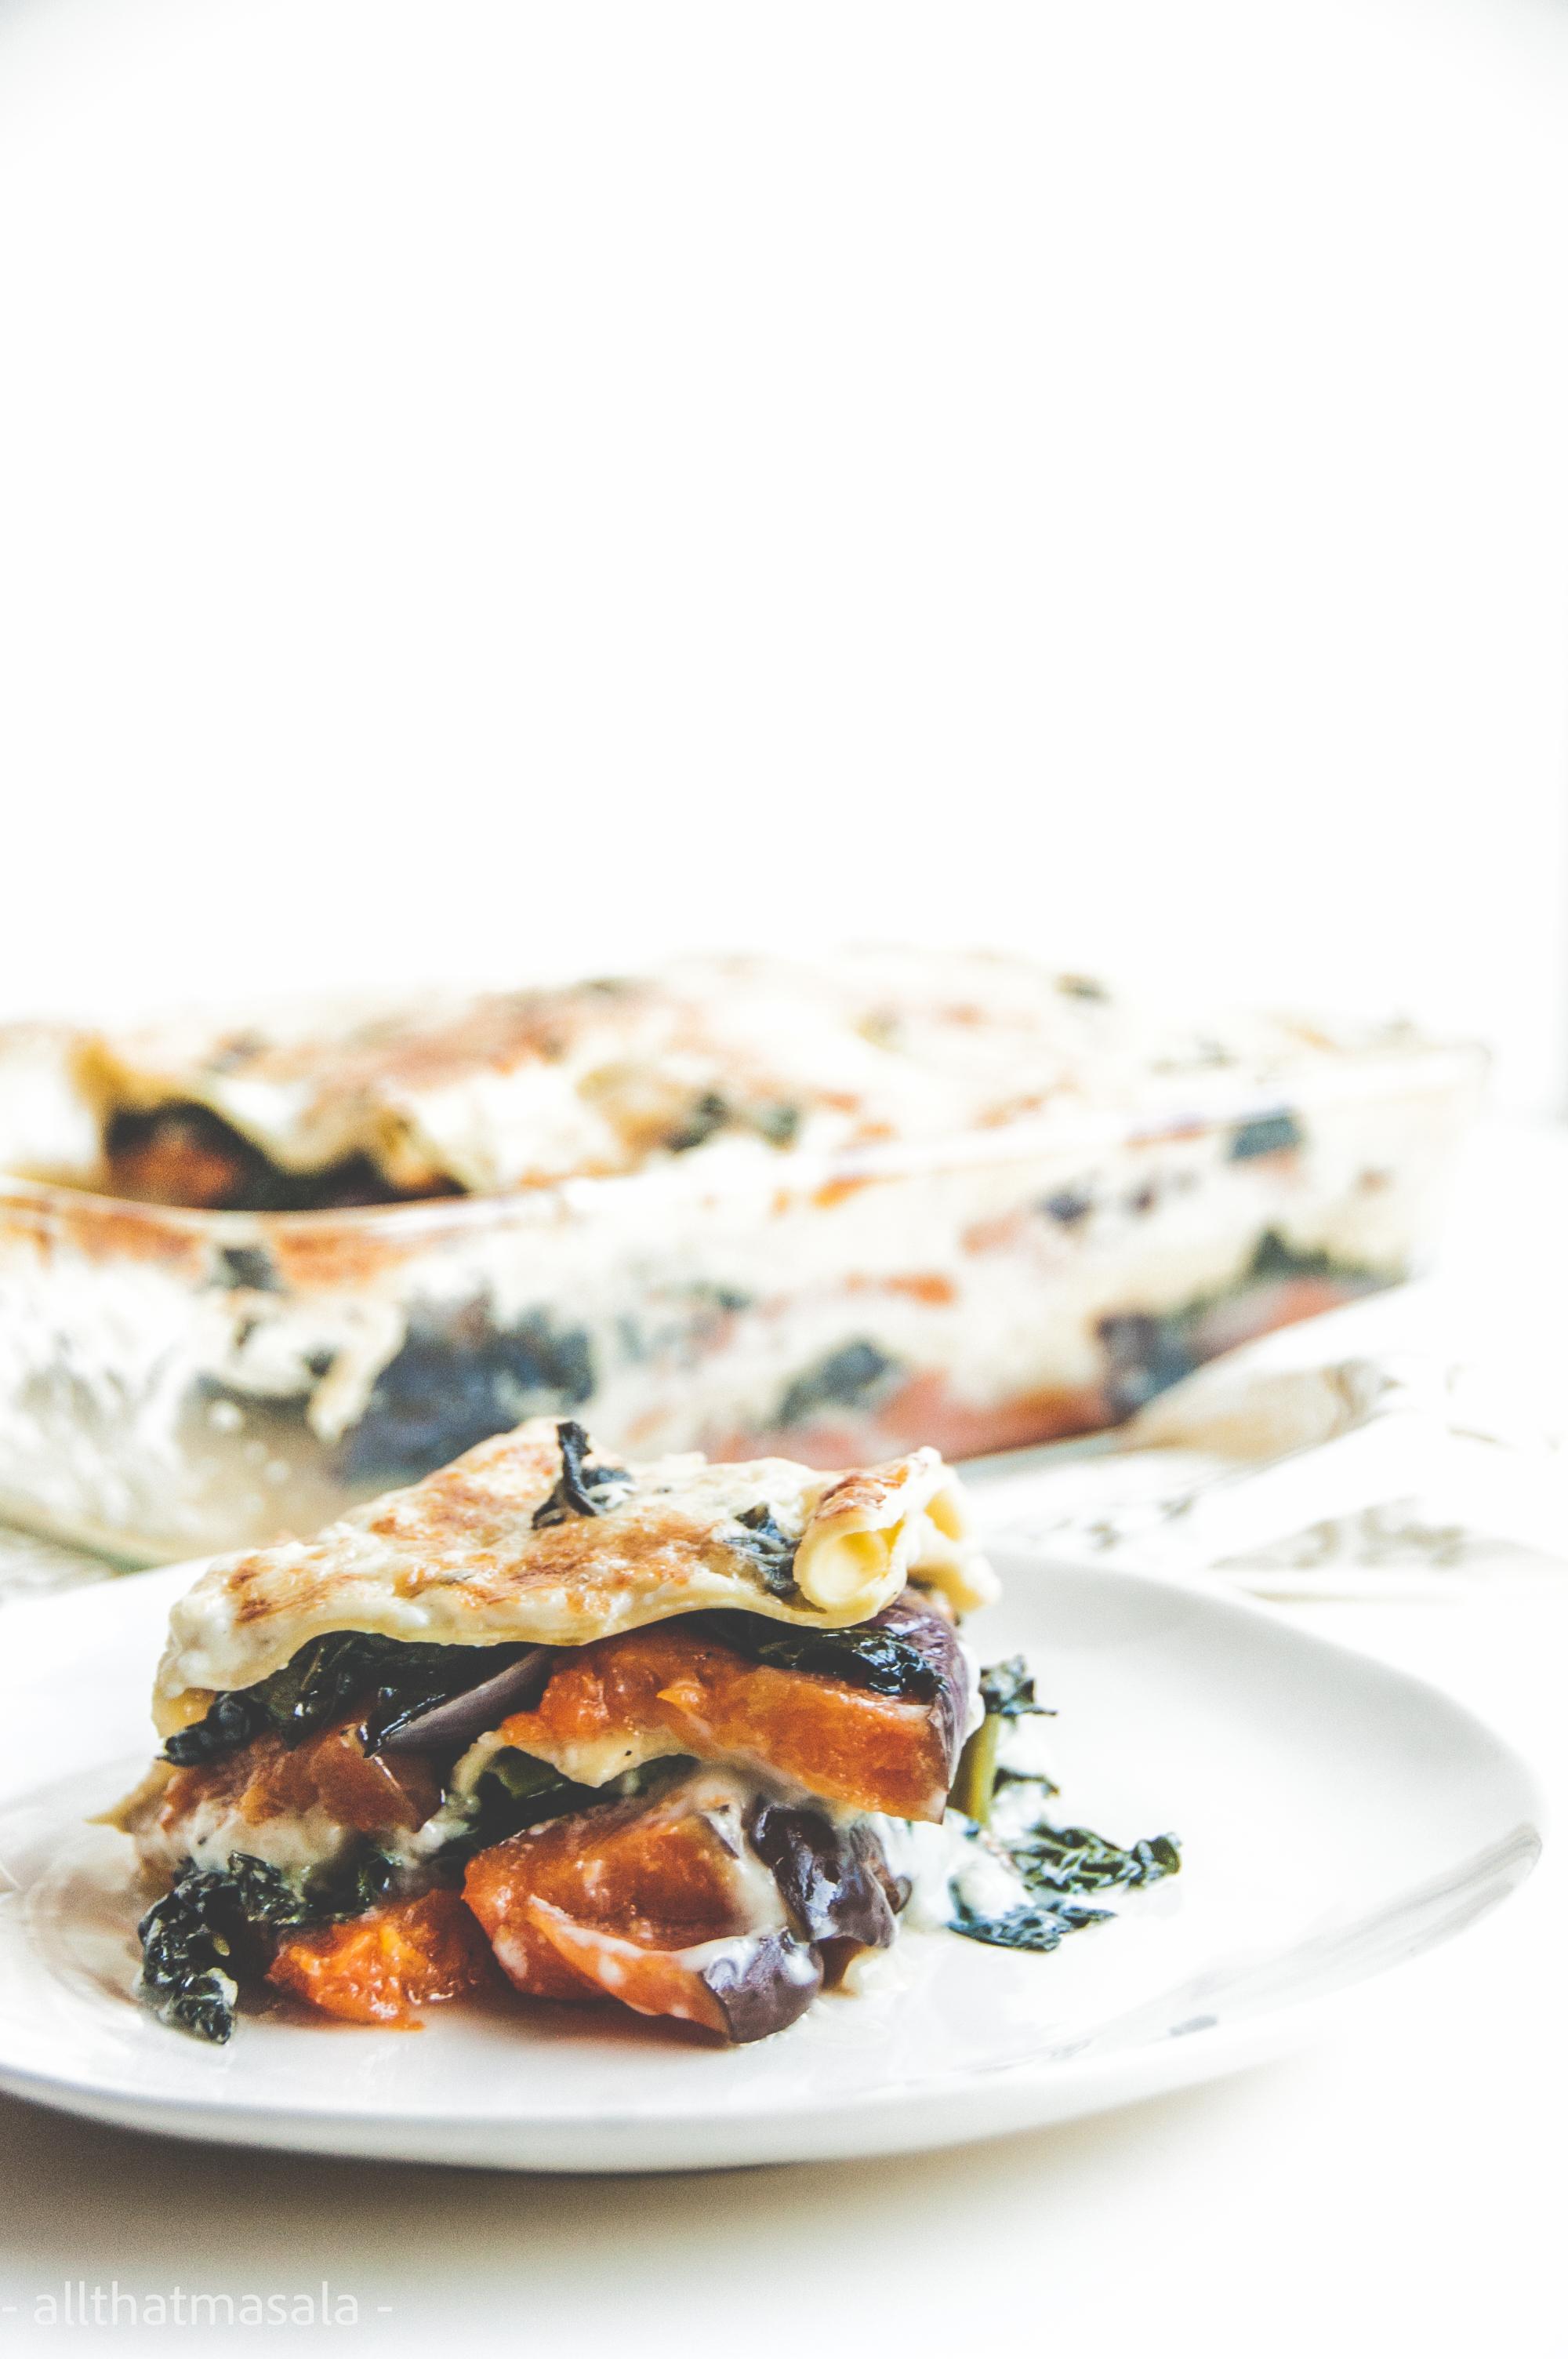 Pumpkin kale lasagna makes a warm pot of autumn dinner delight. This vegetarian lasagna recipe is made with baked cinderella pumpkin, stir fried kale, and warm gooey bechamel sauce.